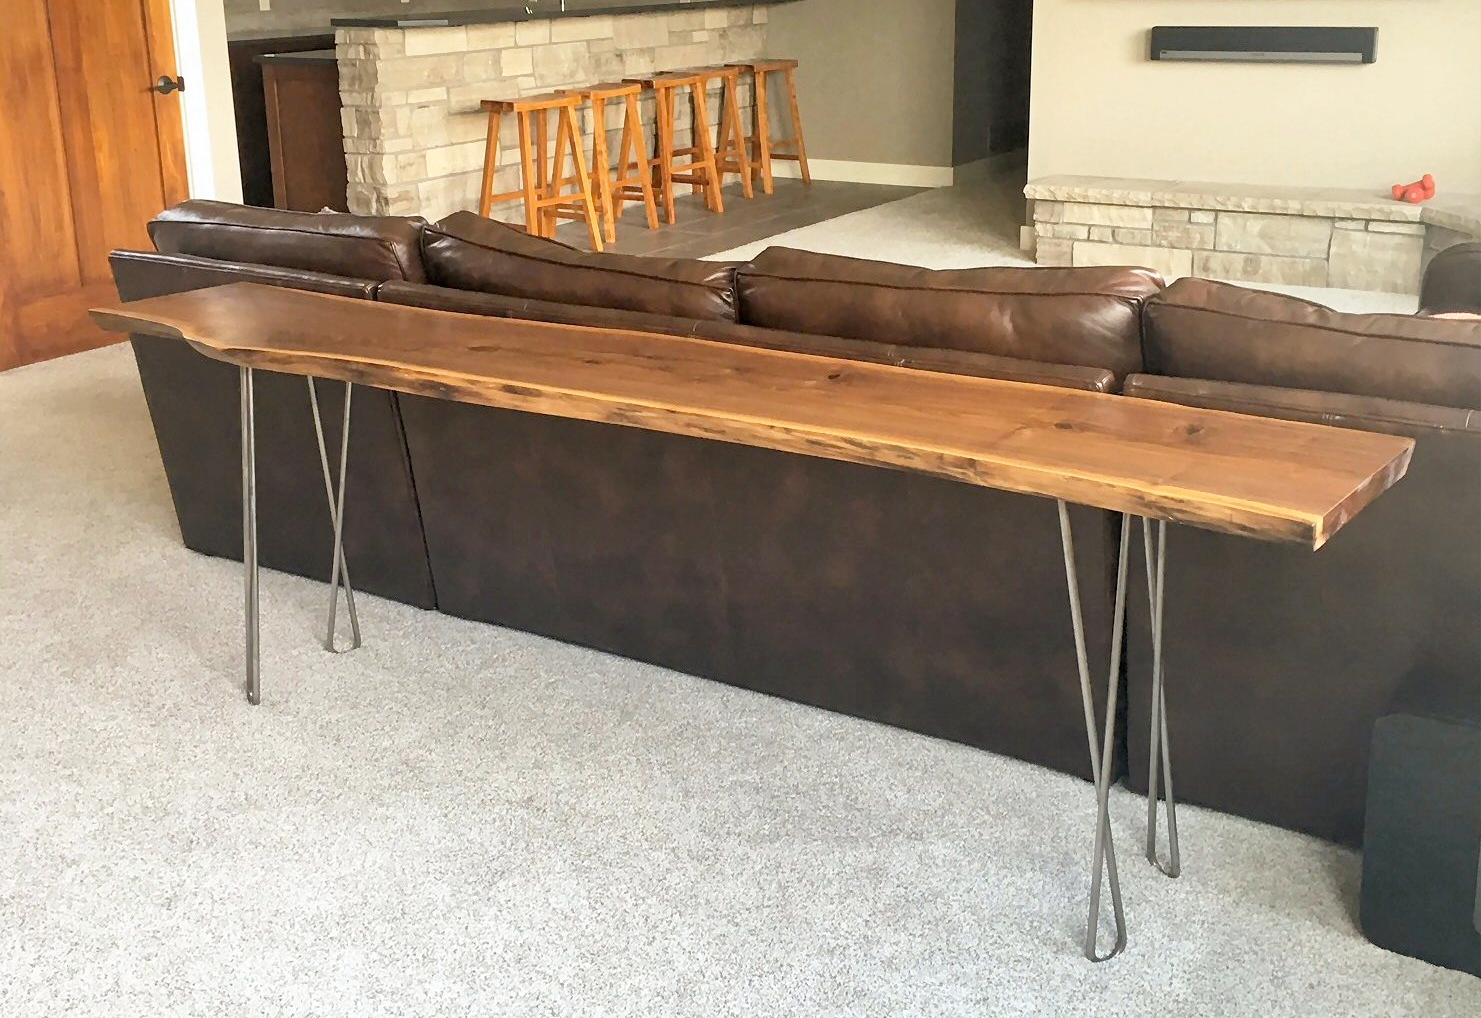 Black walnut live edge sofa entry table 96 l x 14 w x 30